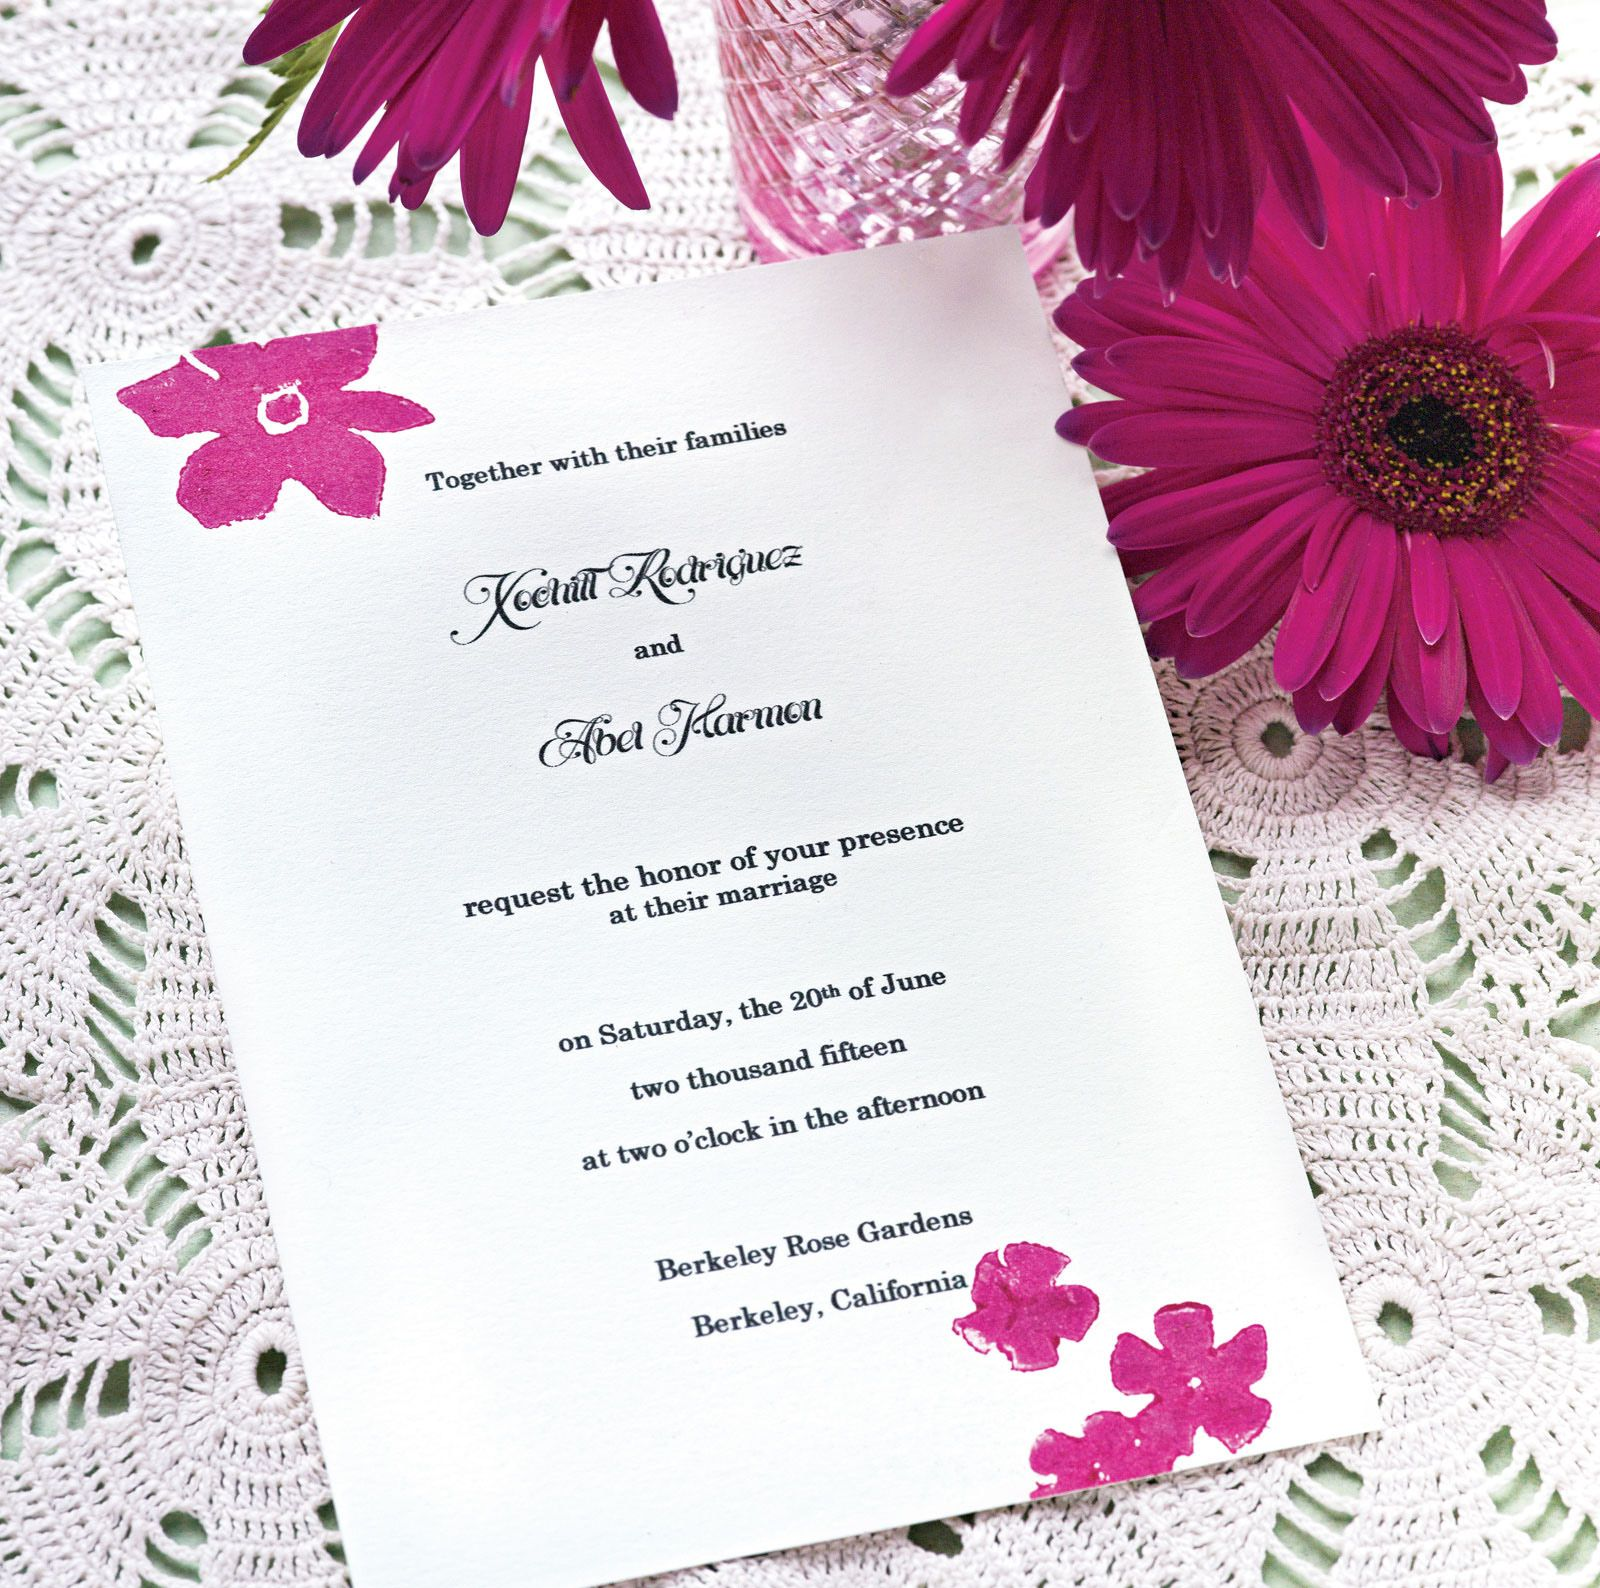 Wedding Invitation Ideas Card | Wedding | Pinterest | Invitation ...